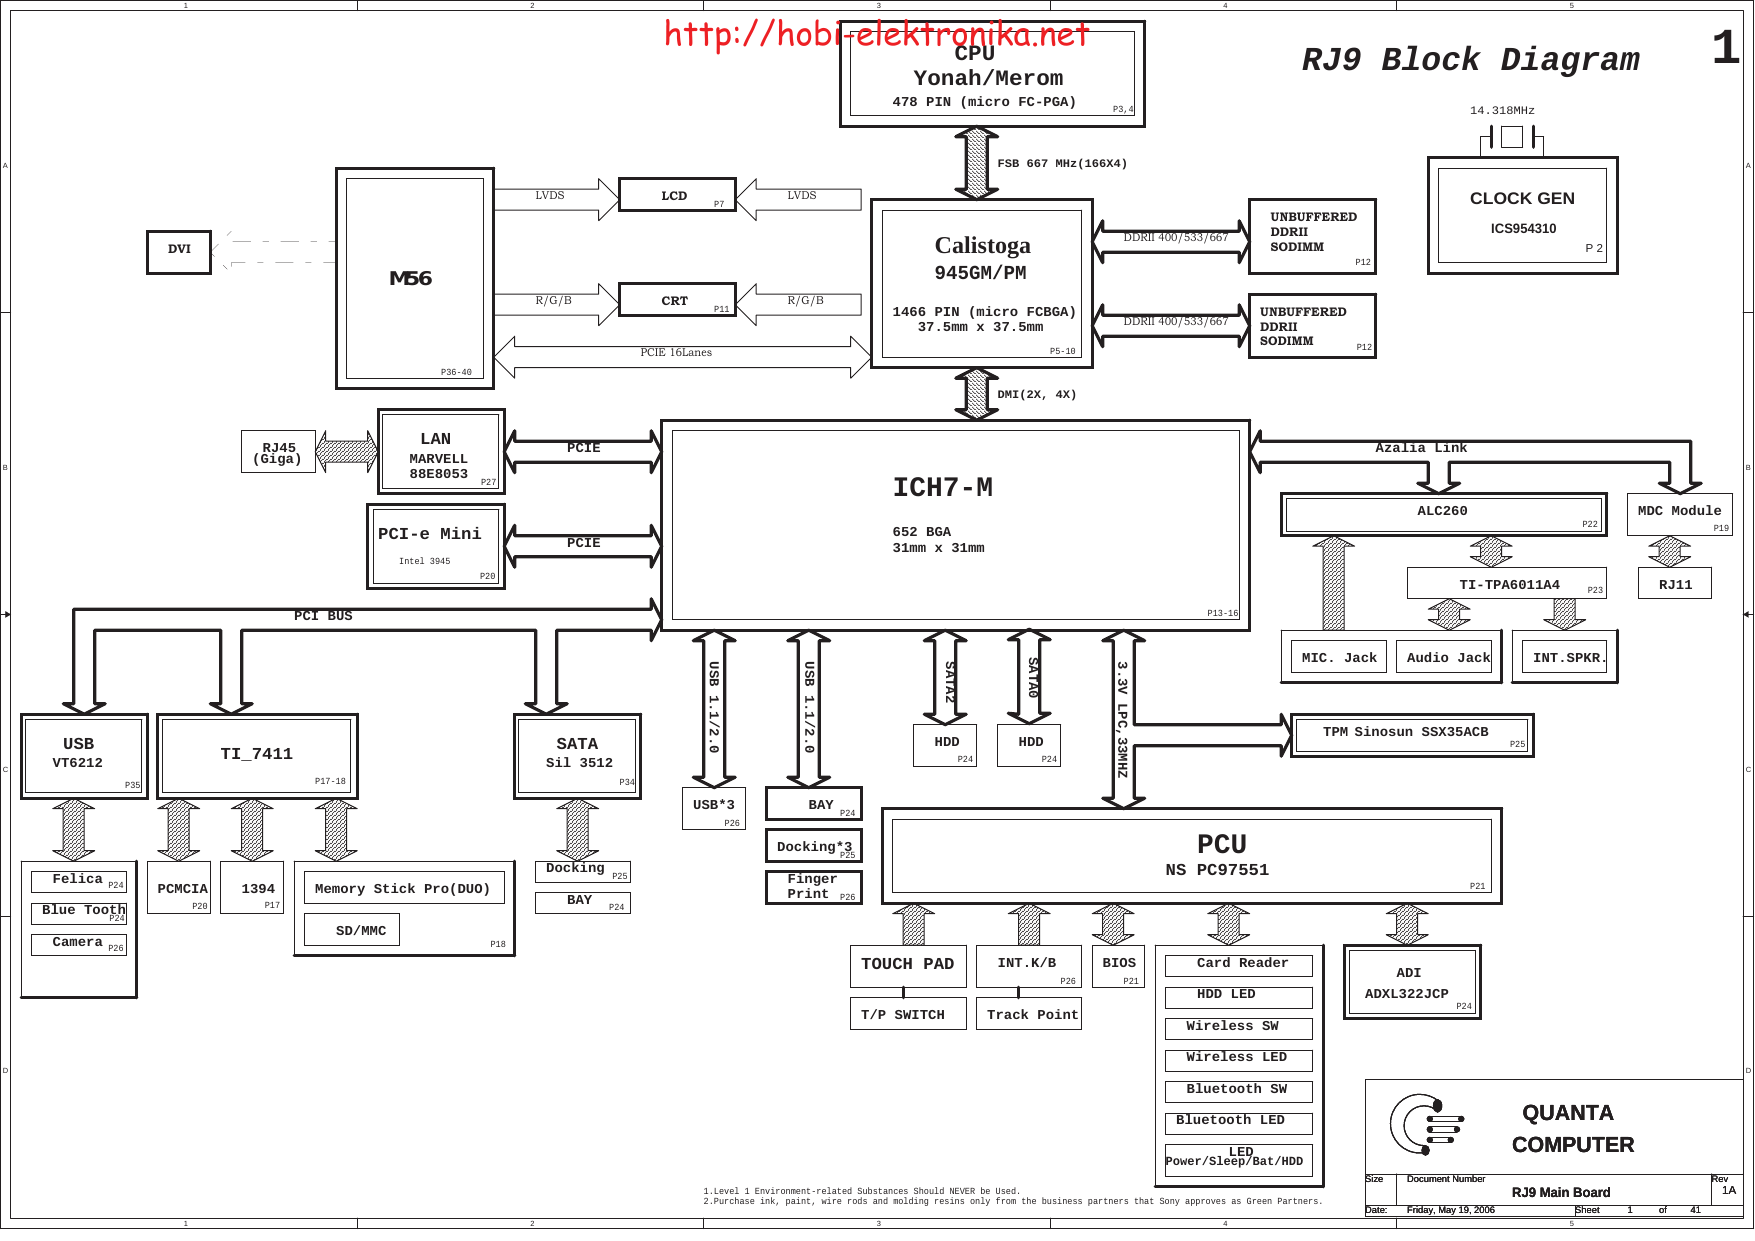 Rj9 mb c 0620 SONY VAIO QUANTA